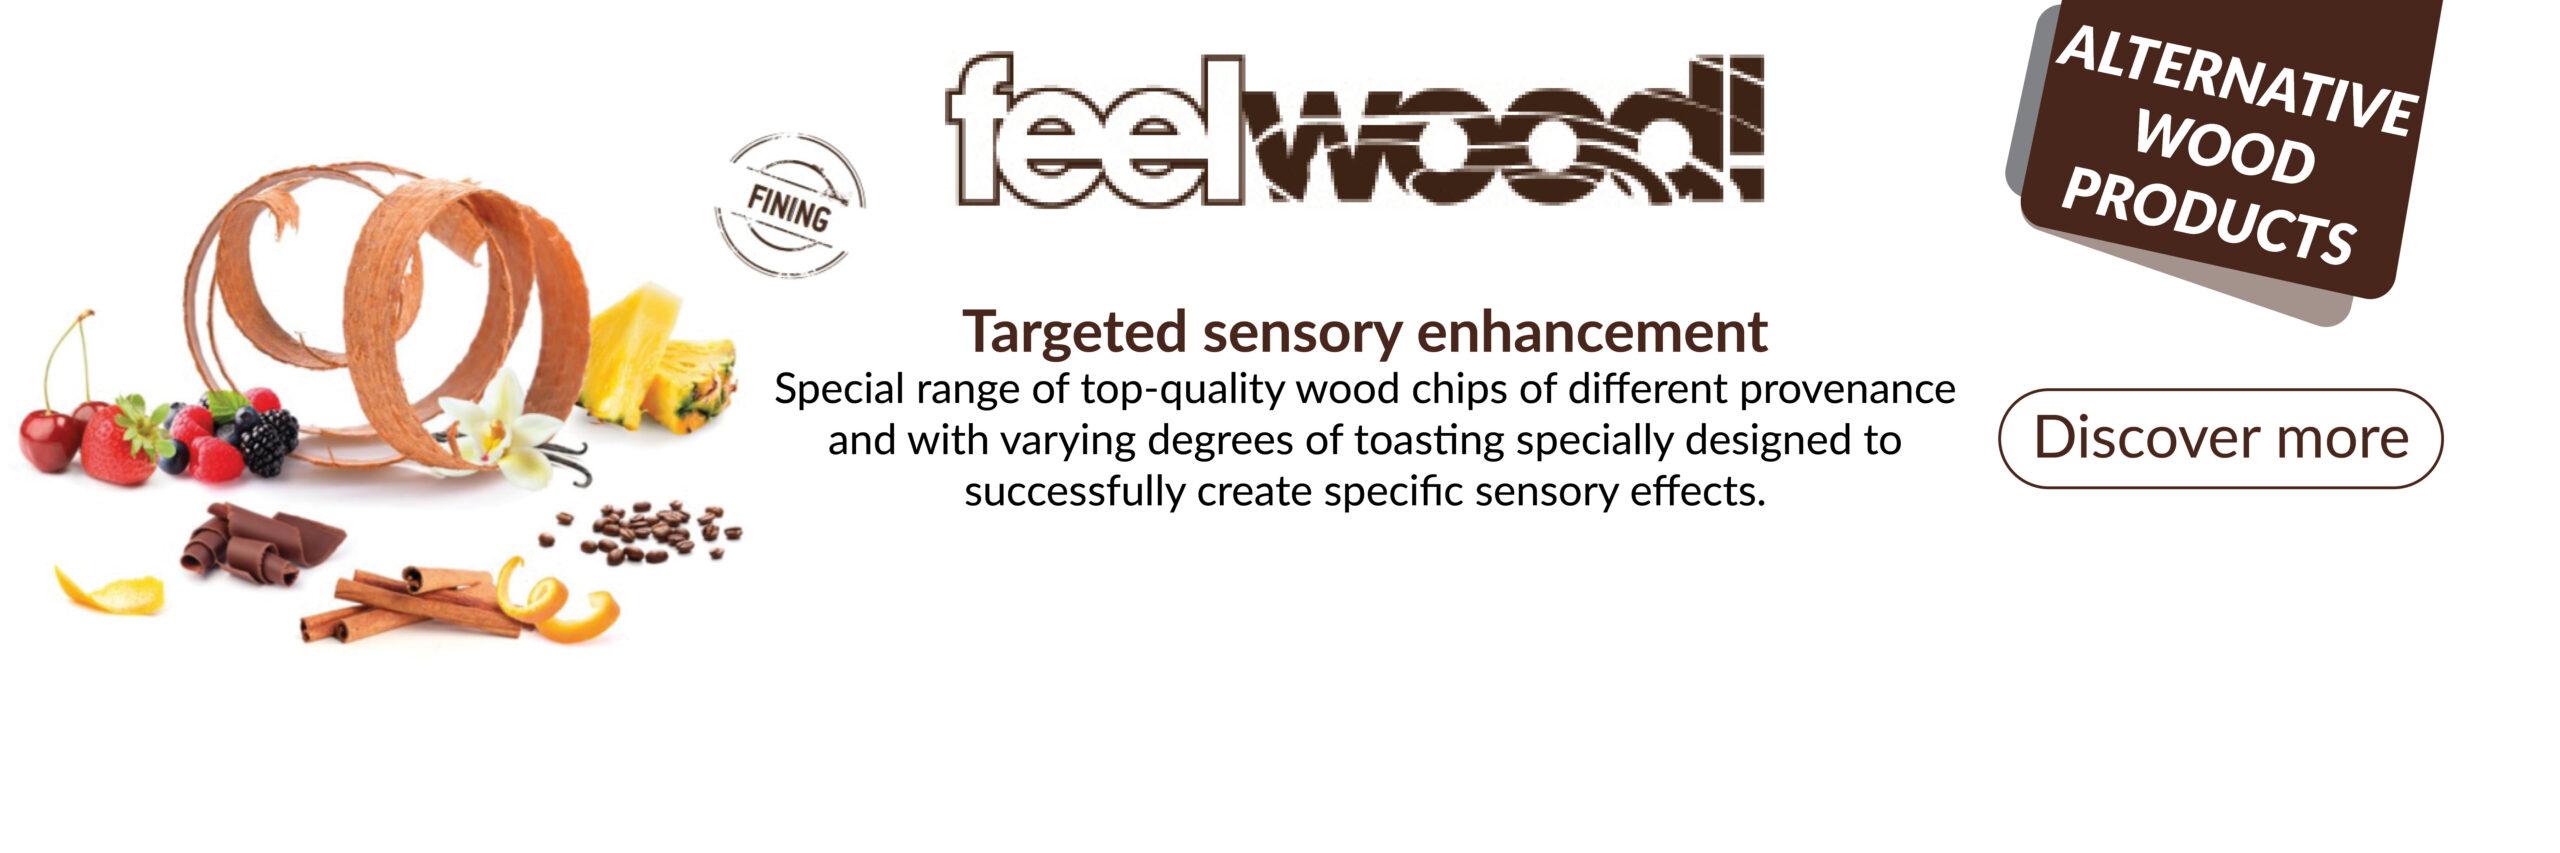 Feelwood! Alternative wood products